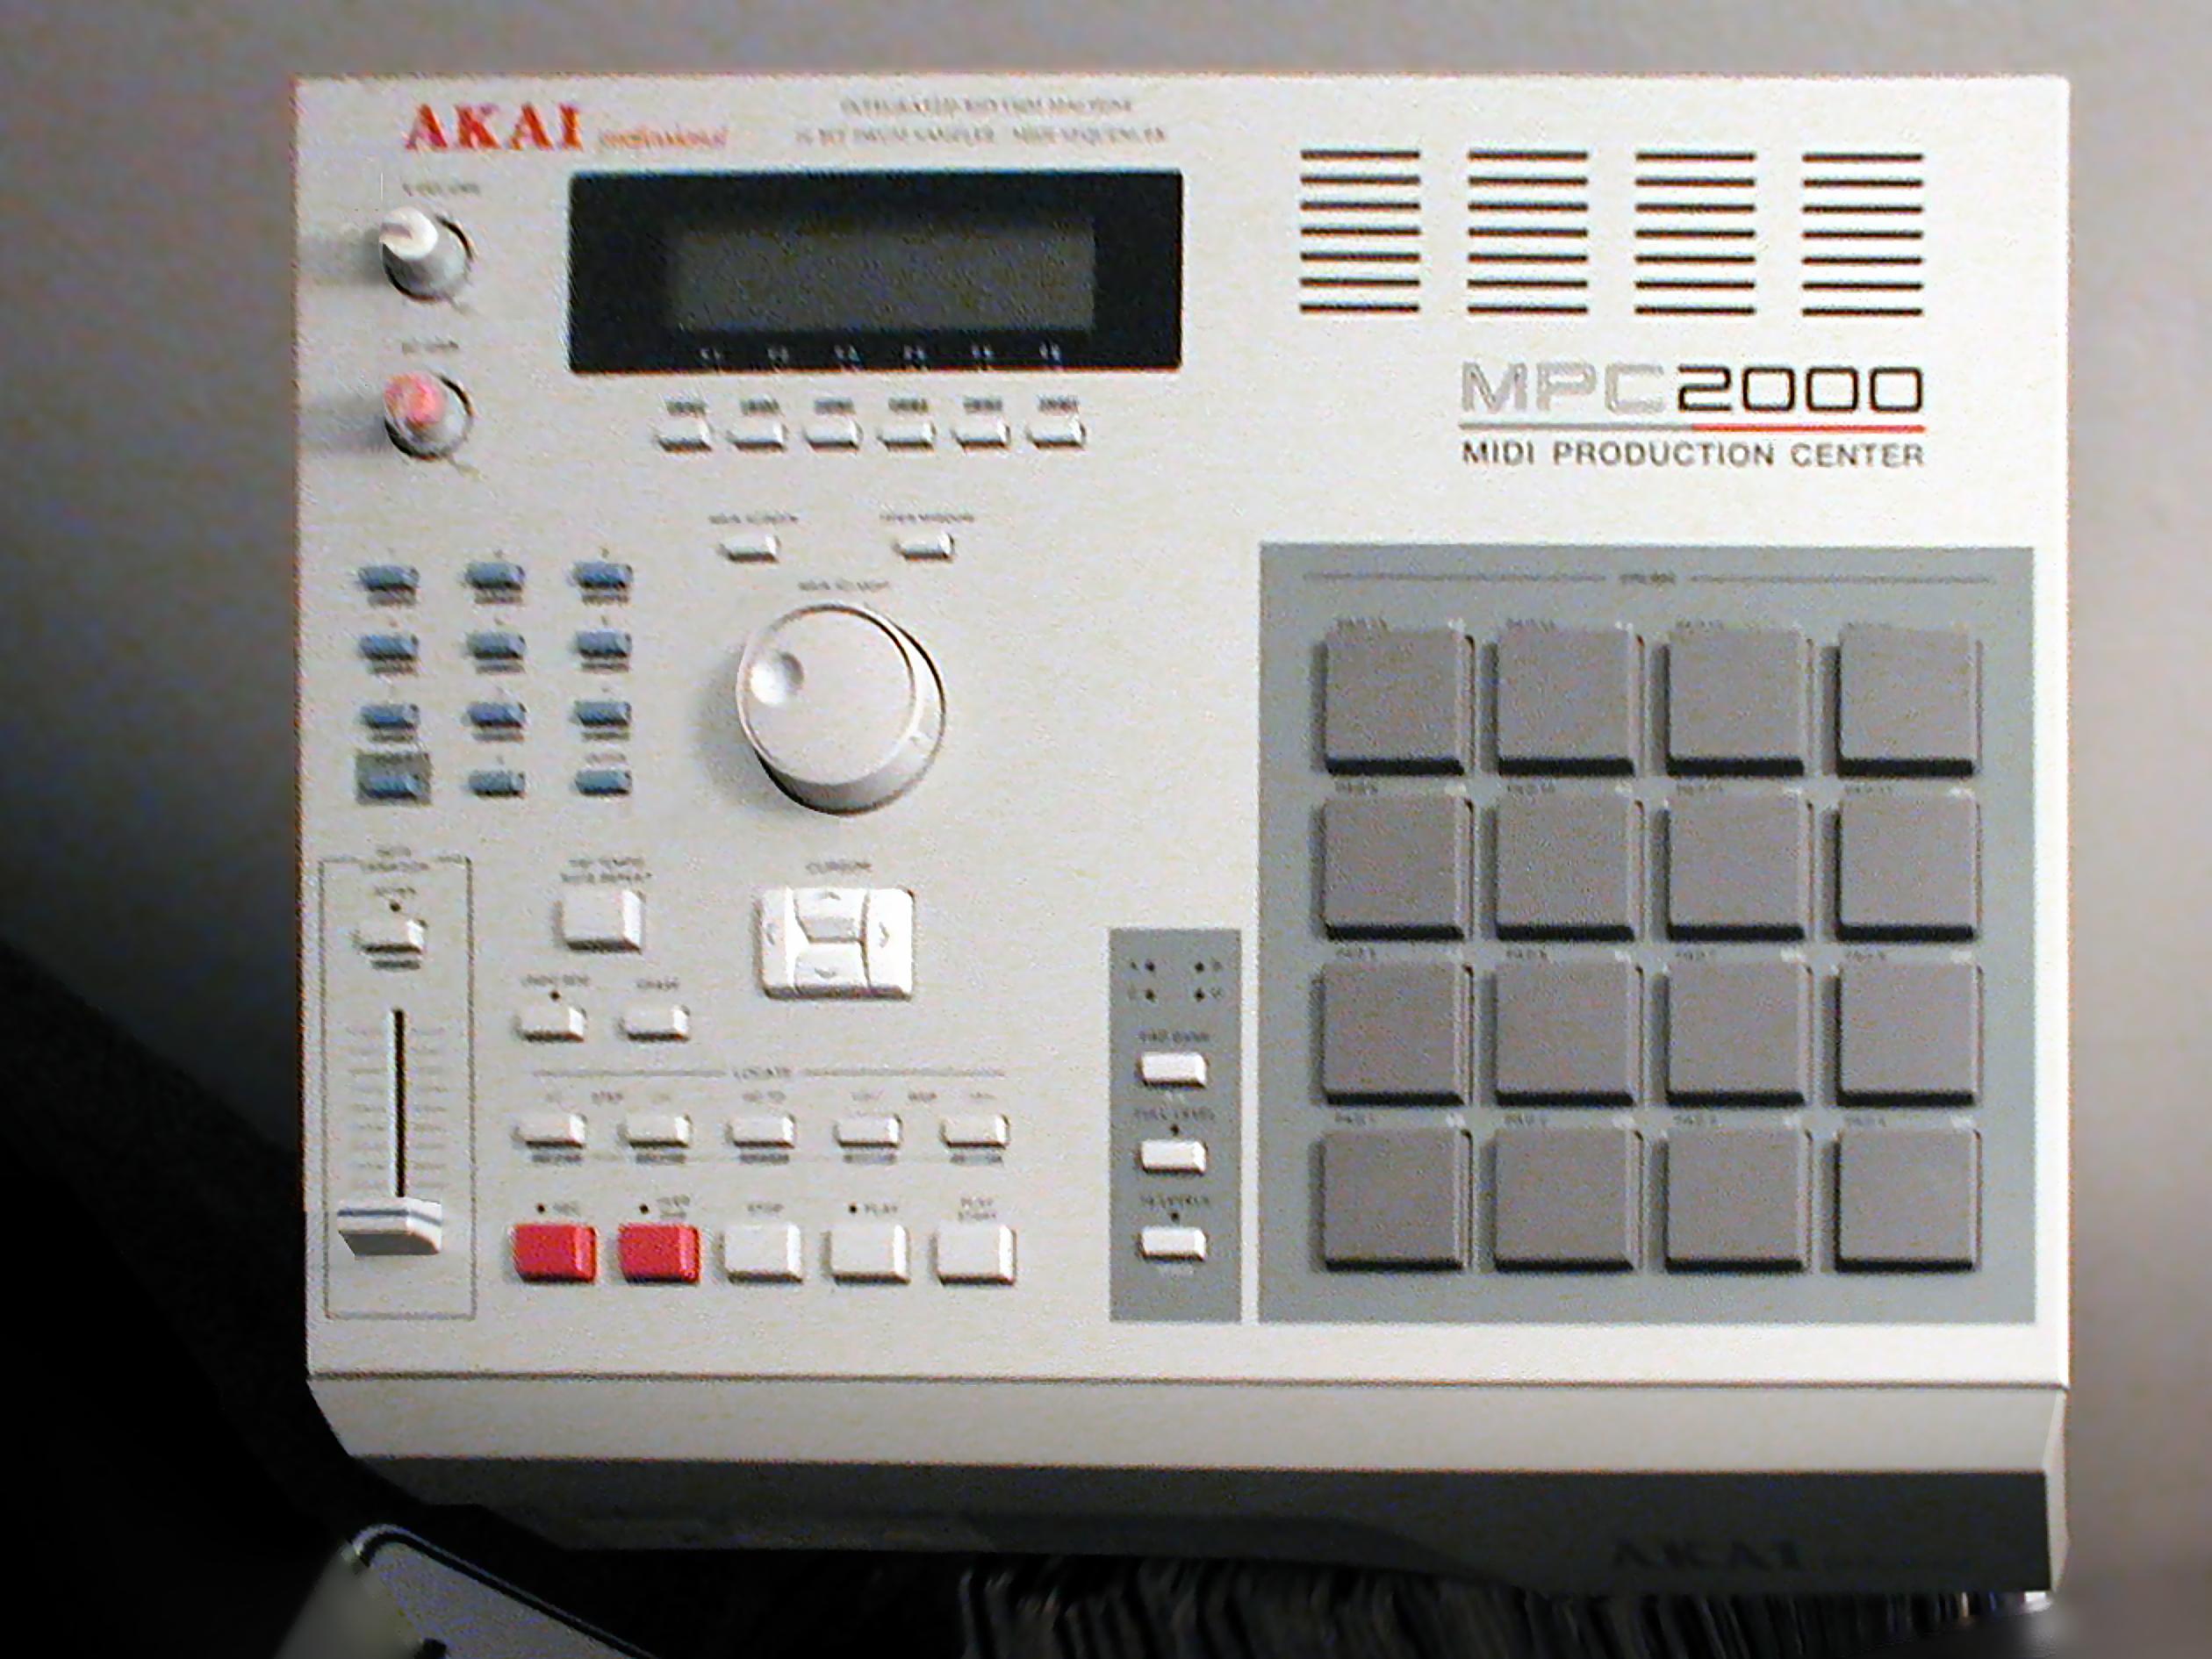 Akai mpc2000 midi production center essay